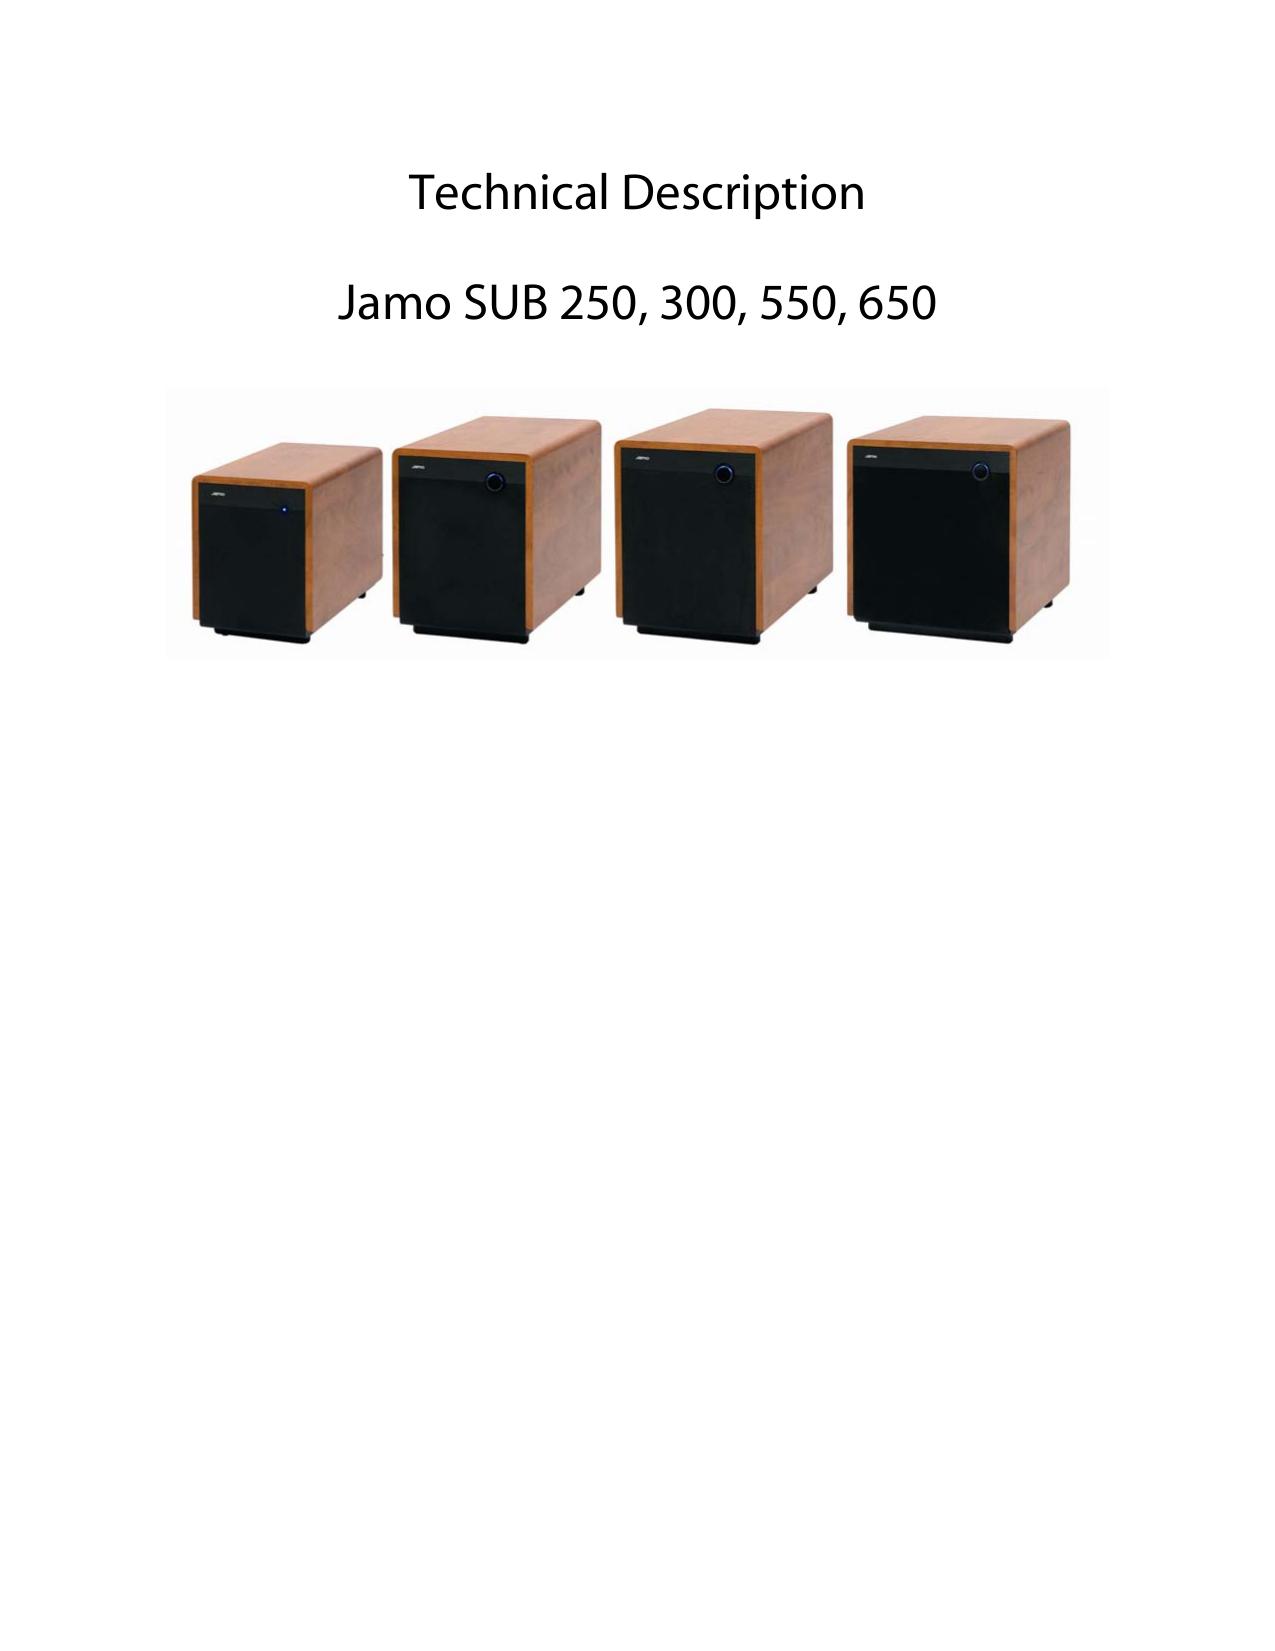 pdf for Jamo Subwoofer SUB 300 manual